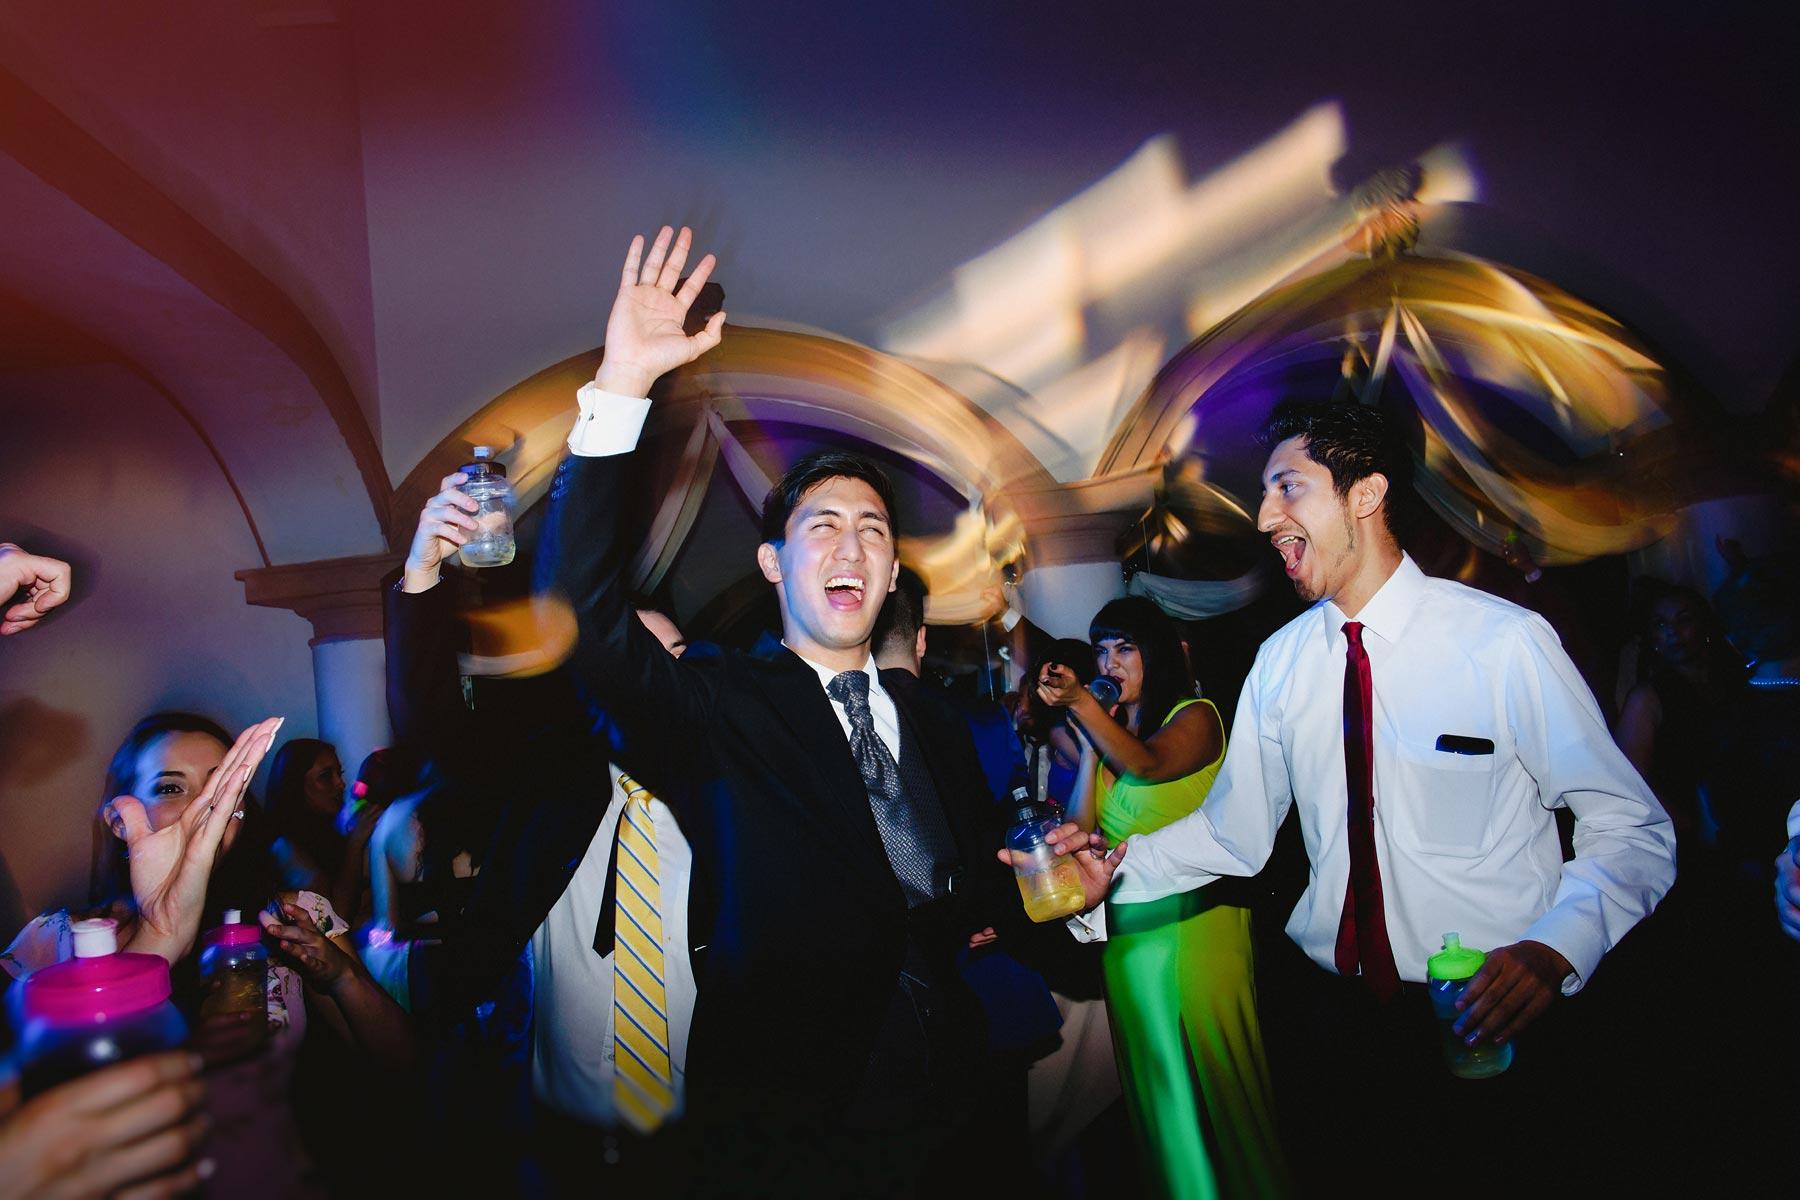 wedding-yasu-diana-34